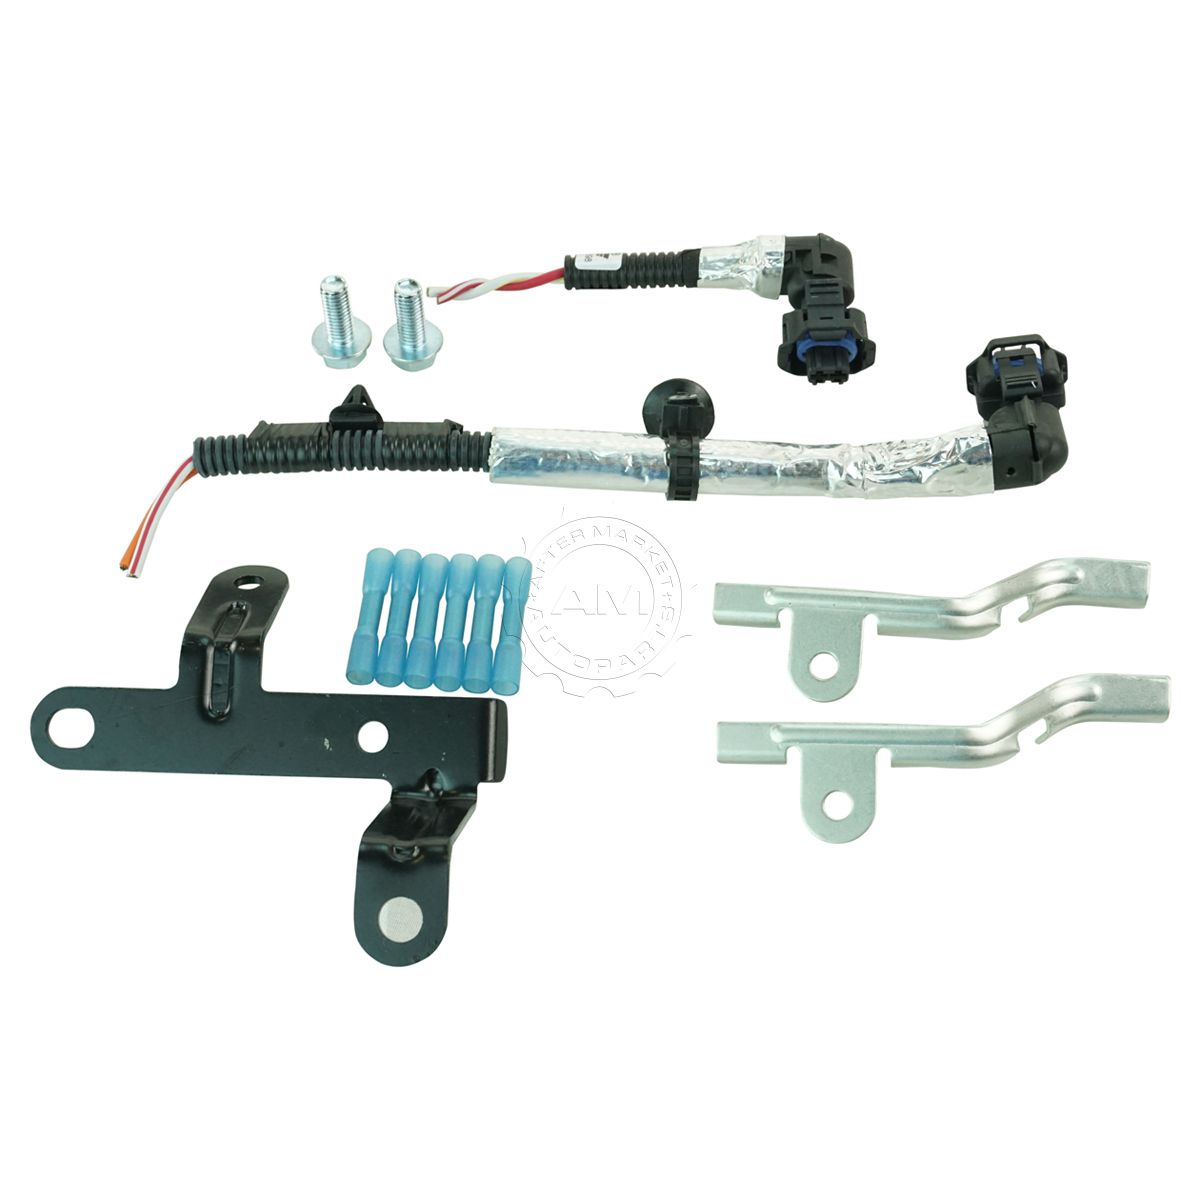 duramax wiring harness problem wire center u2022 rh prixdelor co 6.6 Duramax Wire Harness 2003 Duramax Engine Harness Diagram